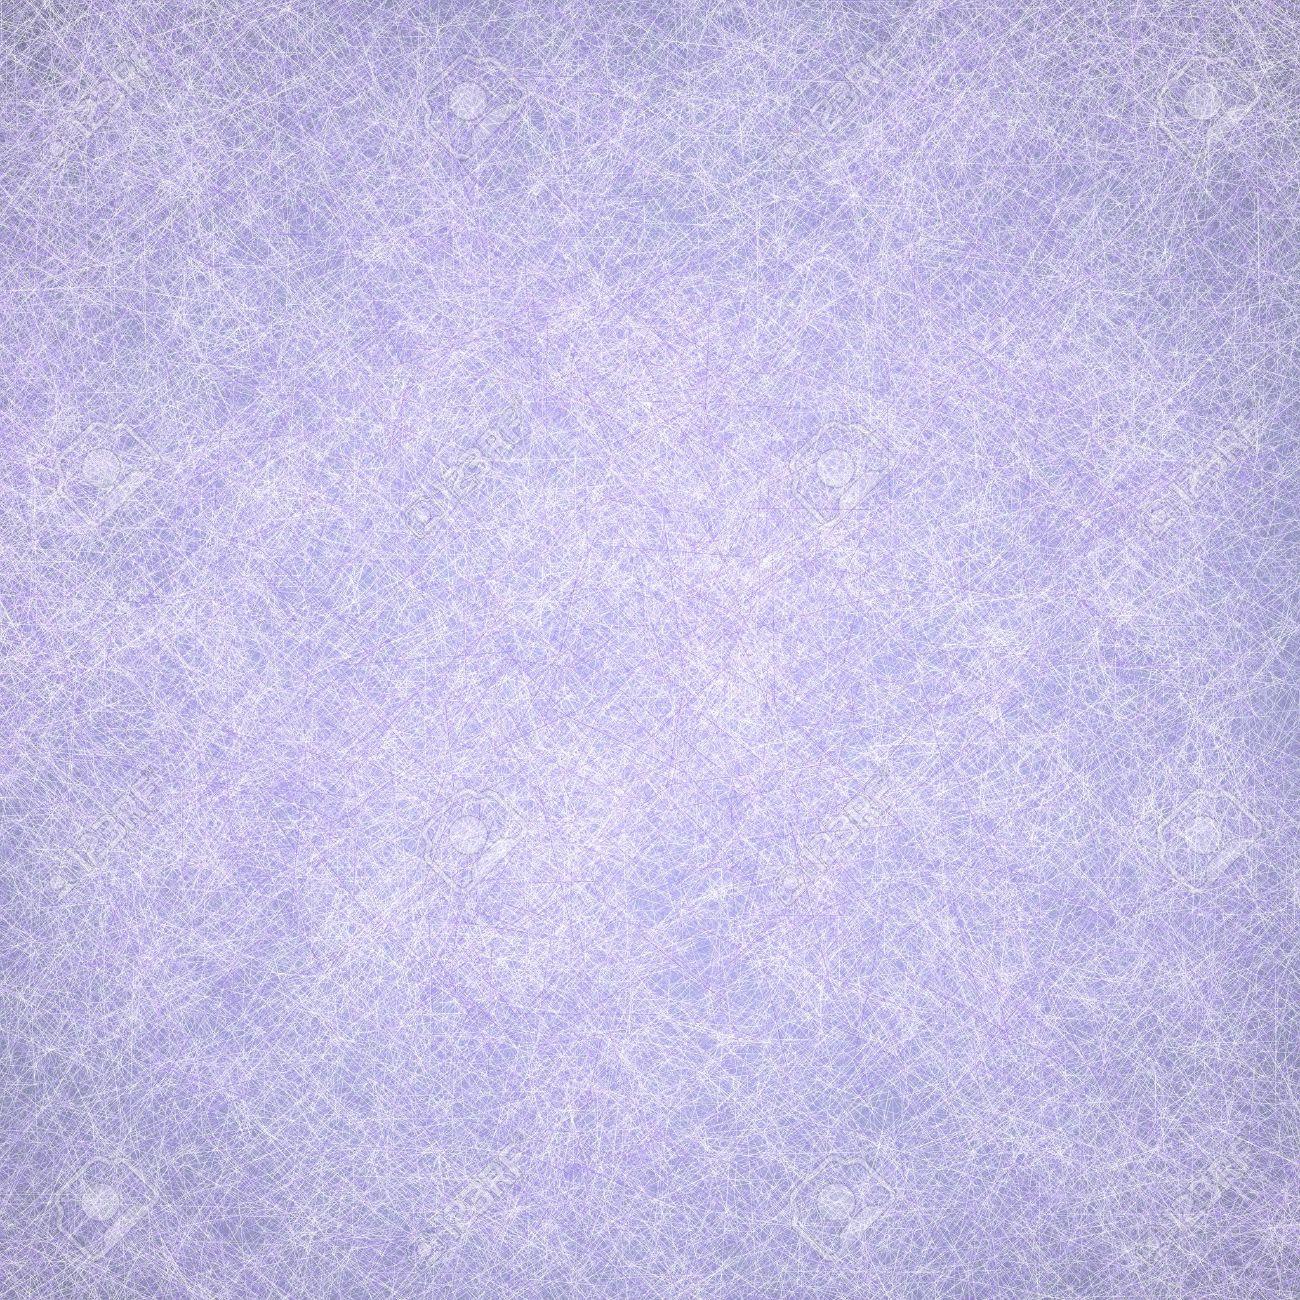 Solid Pastel Purple Background Texture, Light Purple Color And ... for Light Purple Background Pattern  587fsj